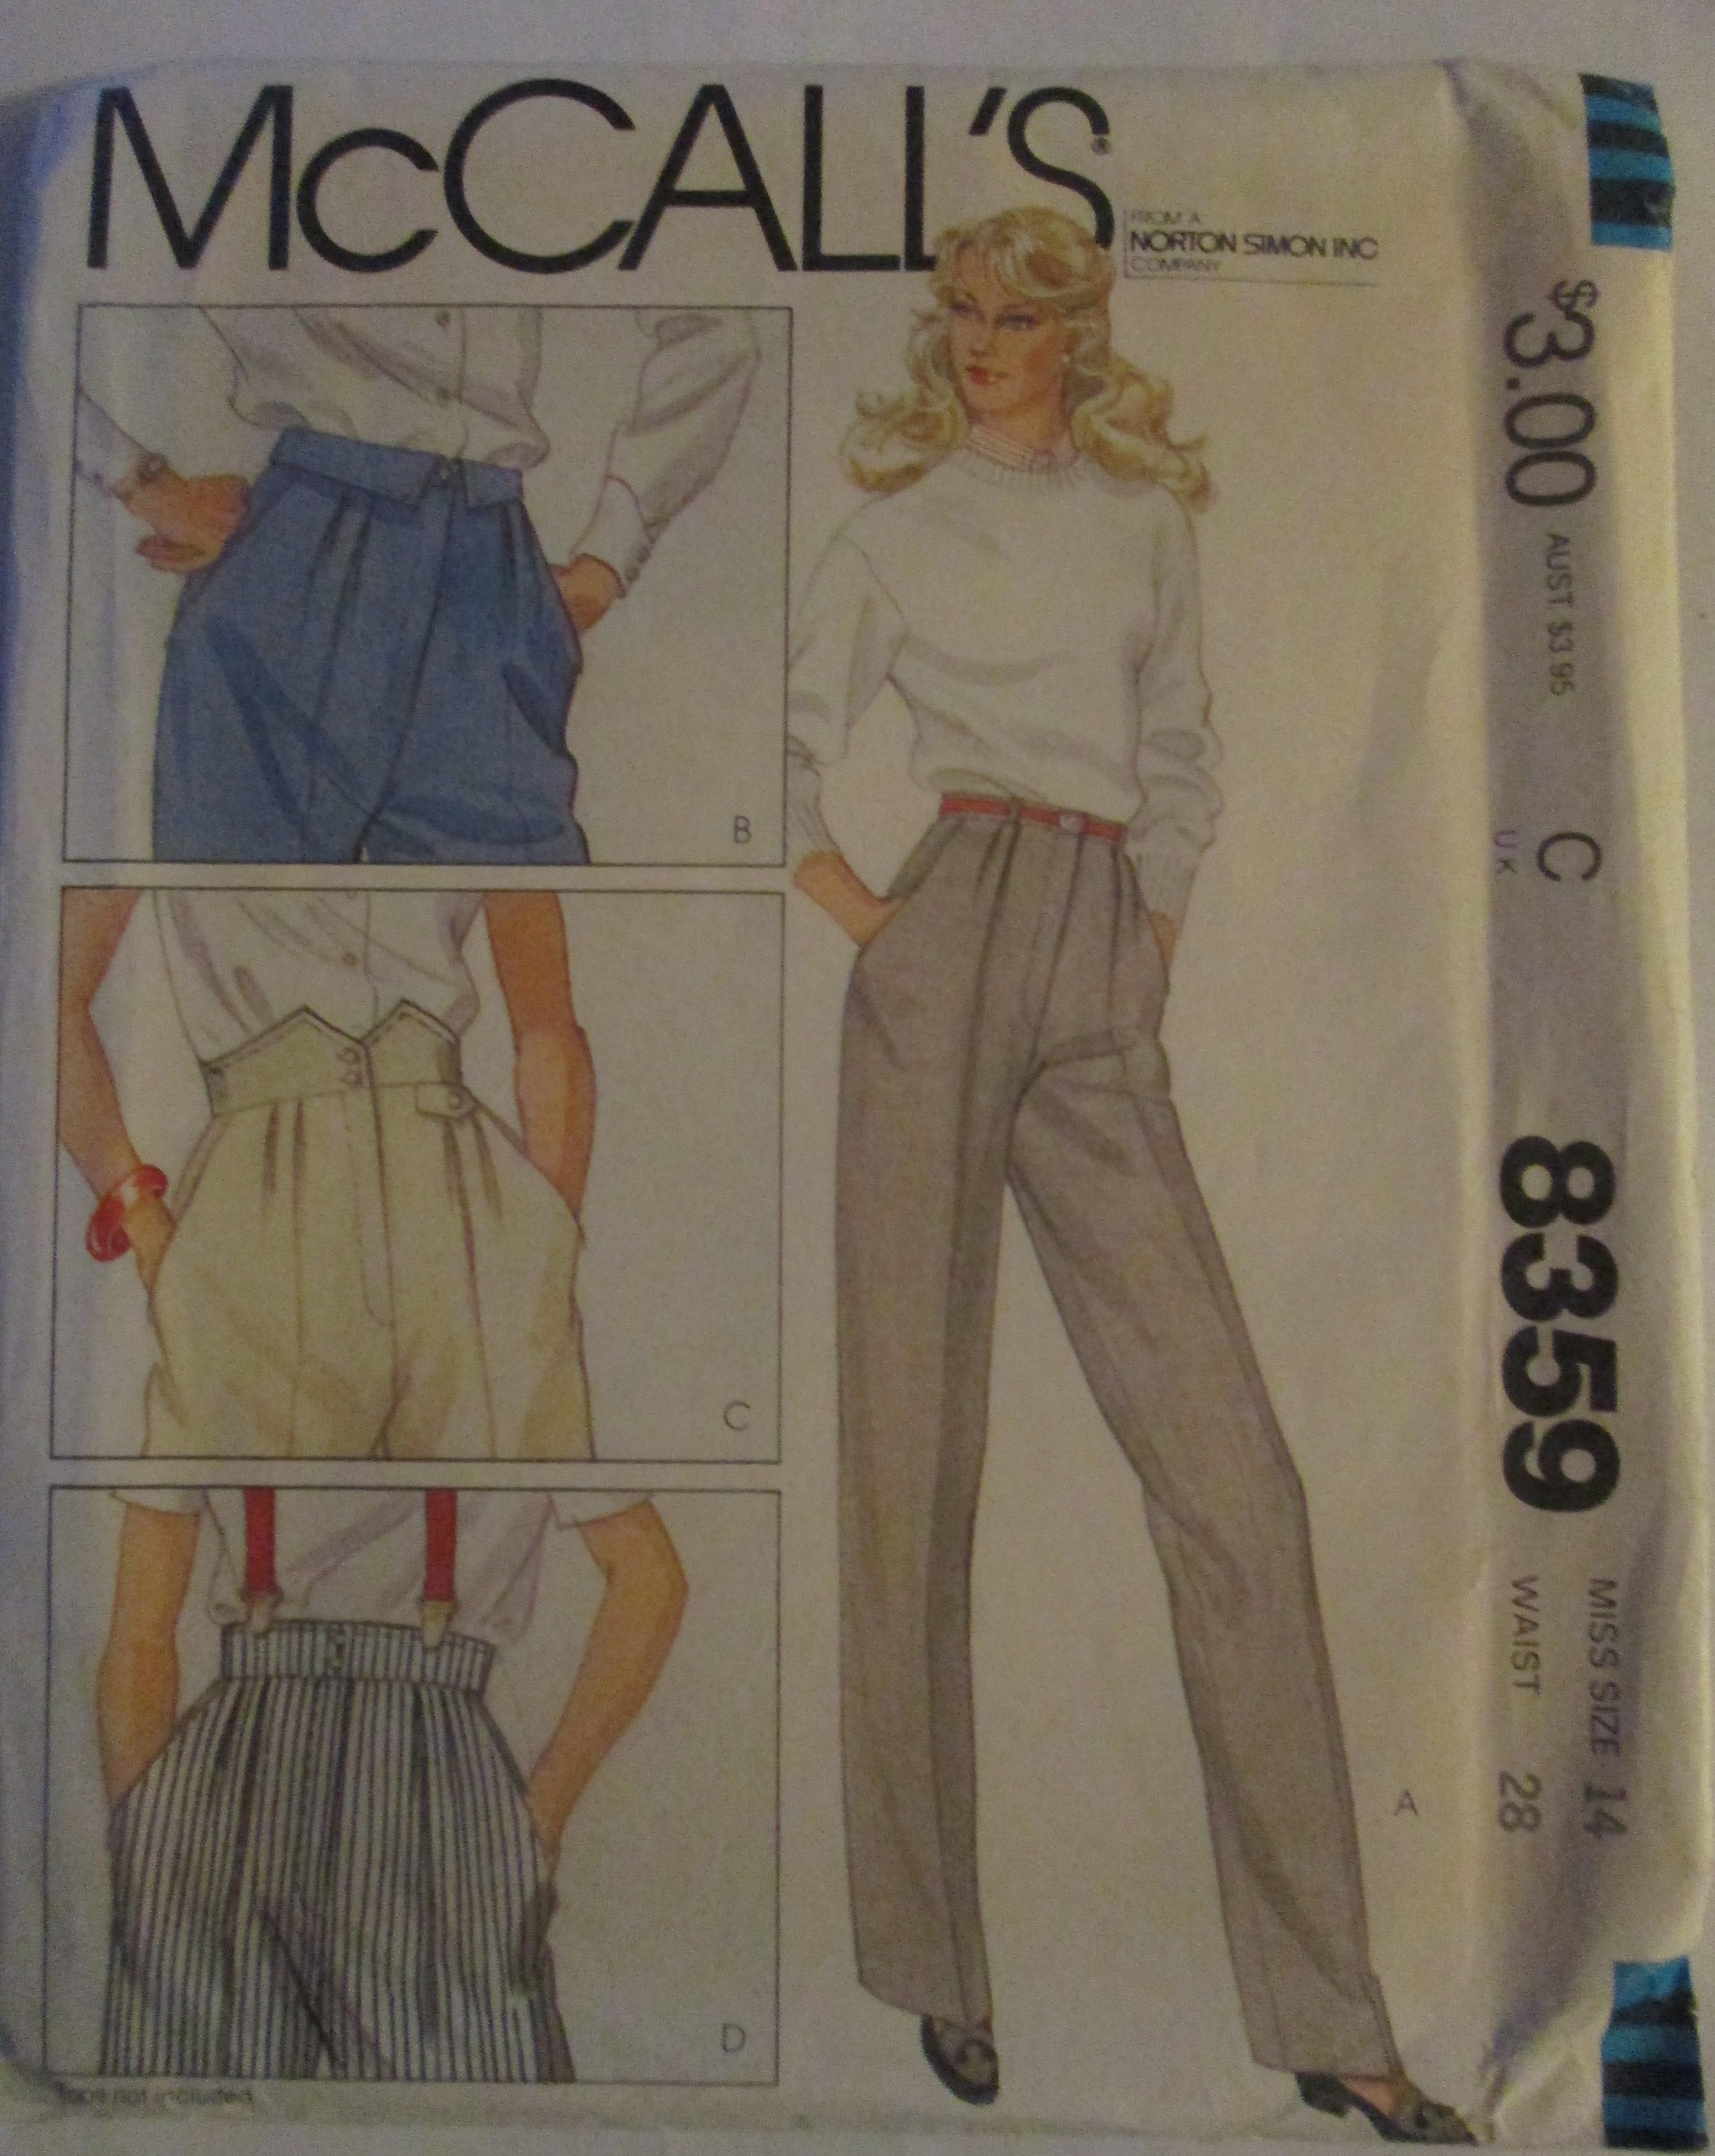 McCall's 8359